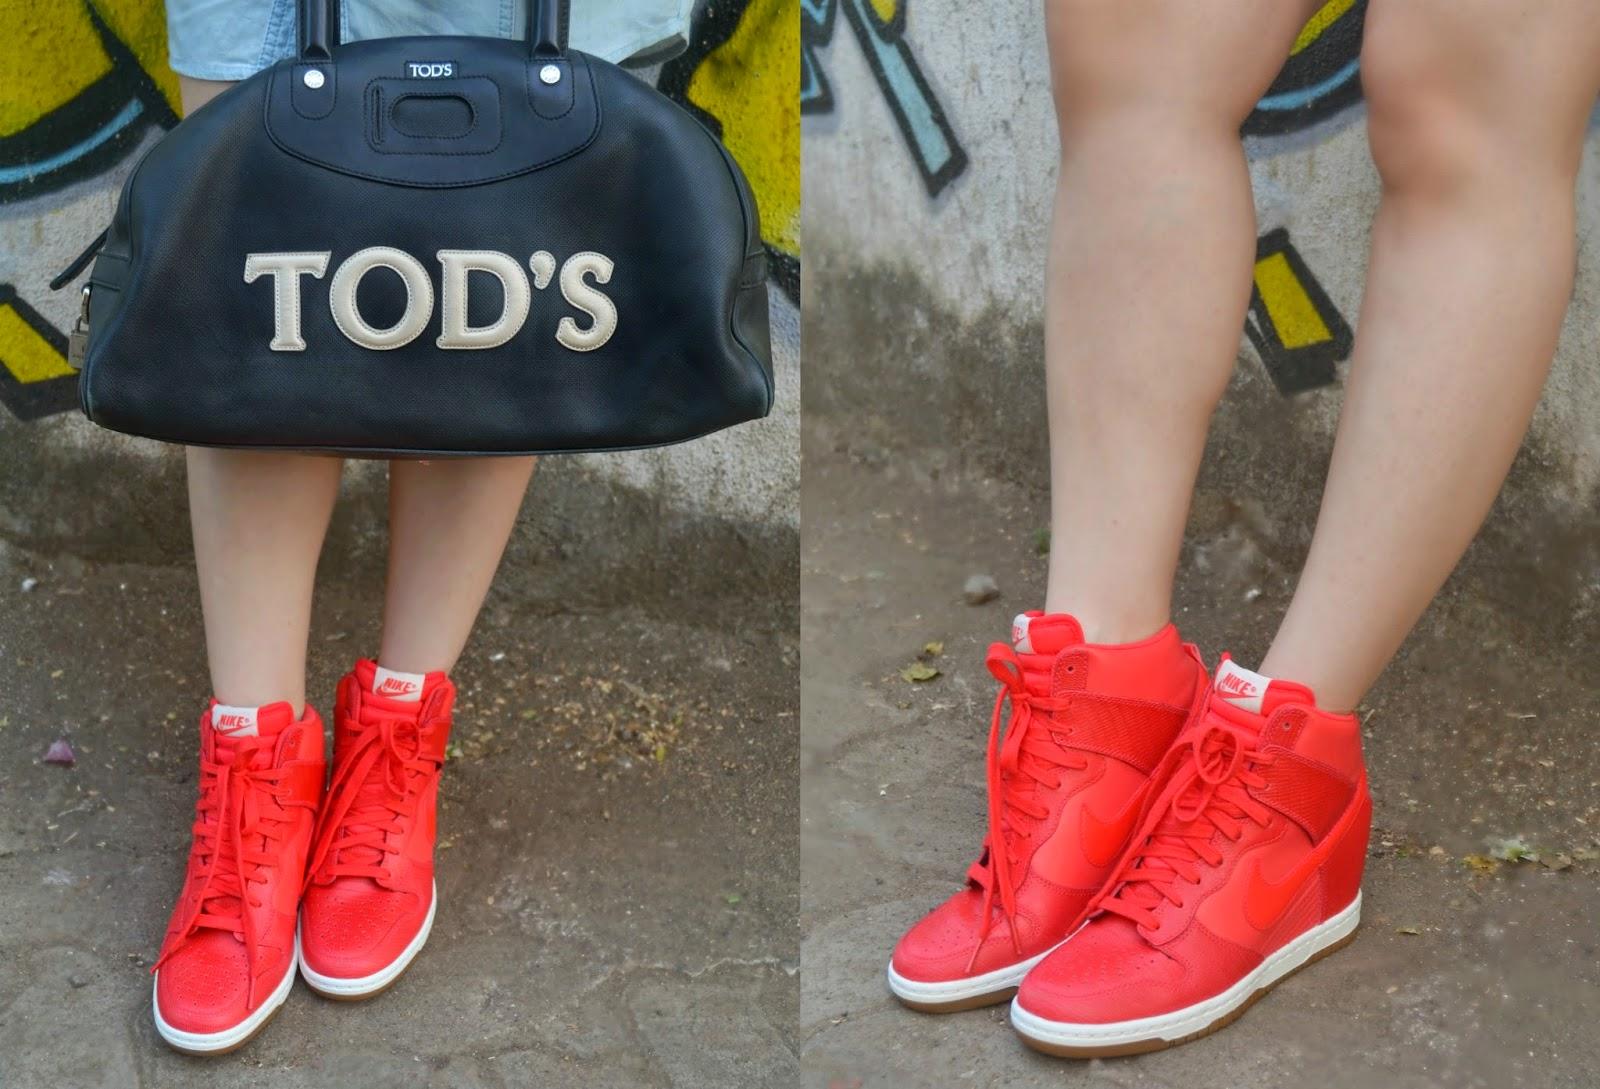 Nike Dunk Sky Hi in red , Tods bag